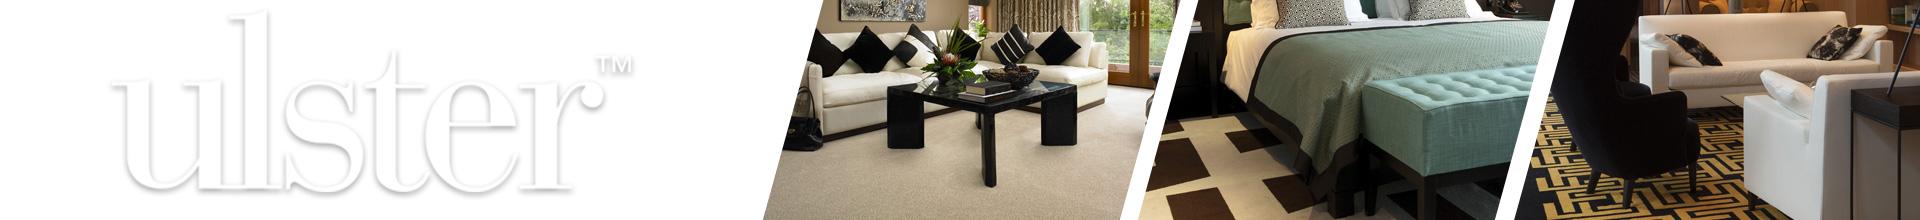 John Lynch Carpets - Ulster Carpets